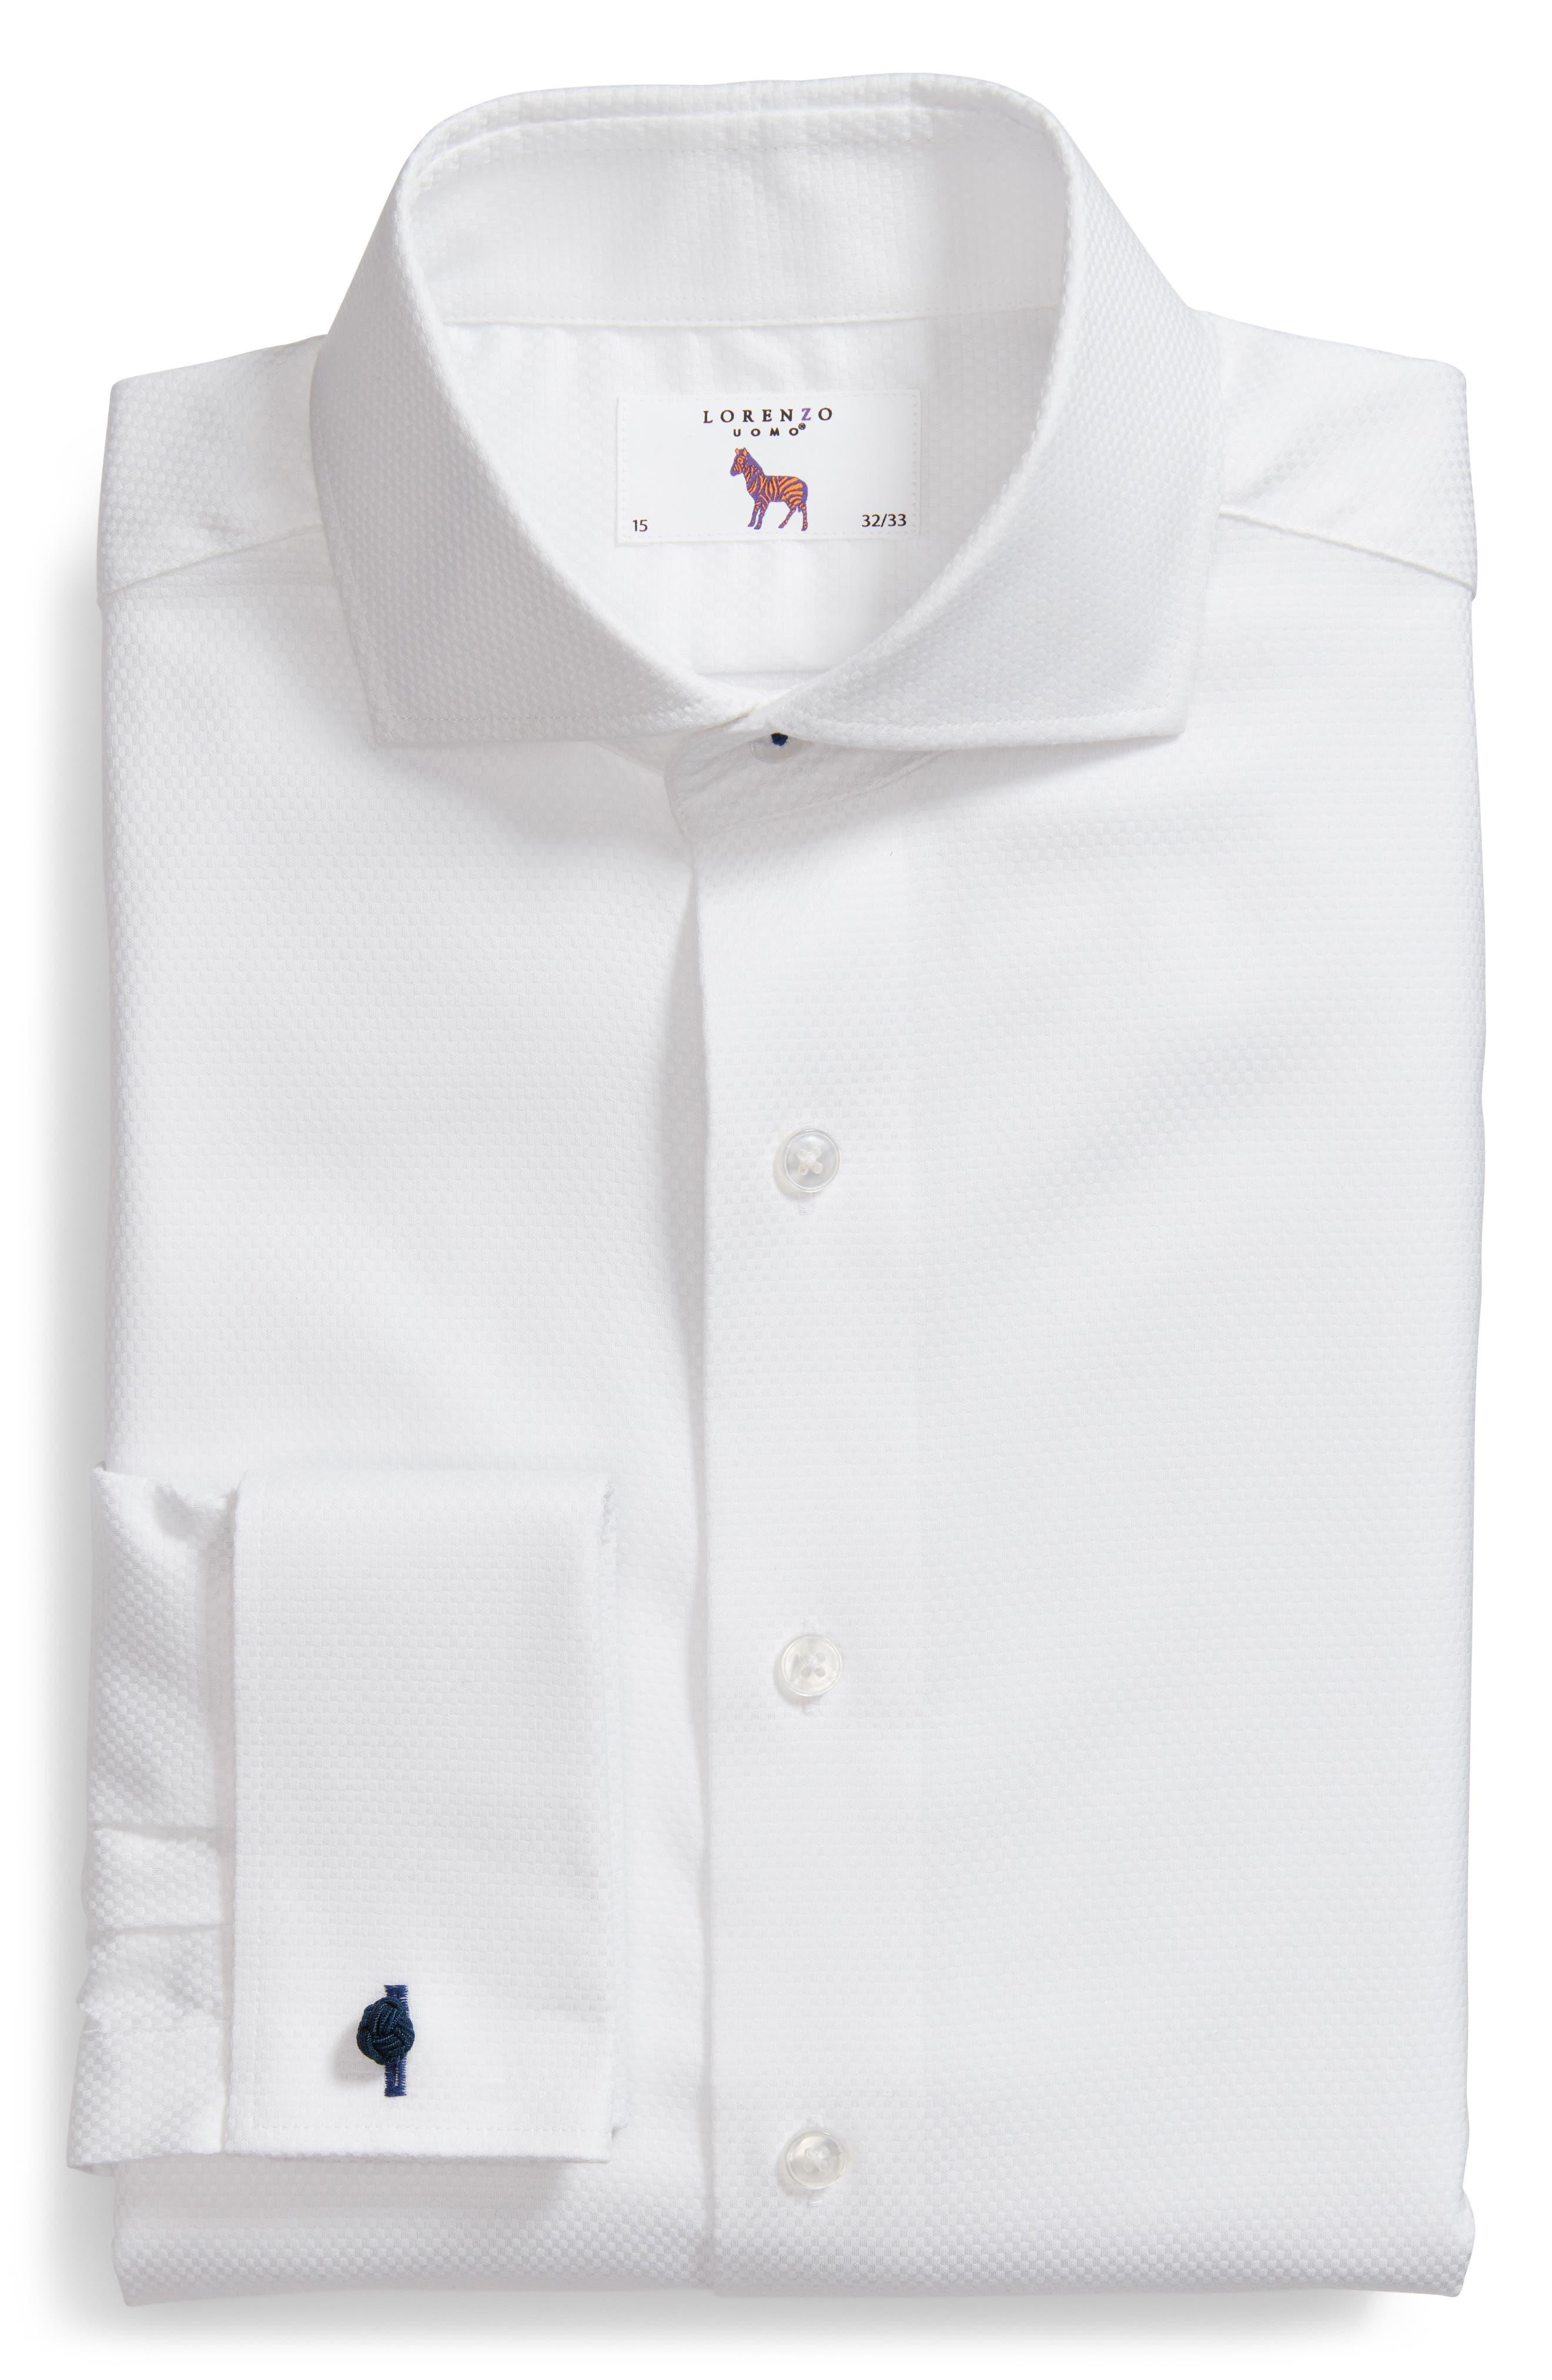 LORENZO UOMO, Trim Fit Basket Weave Dress Shirt, Alternate thumbnail 5, color, WHITE